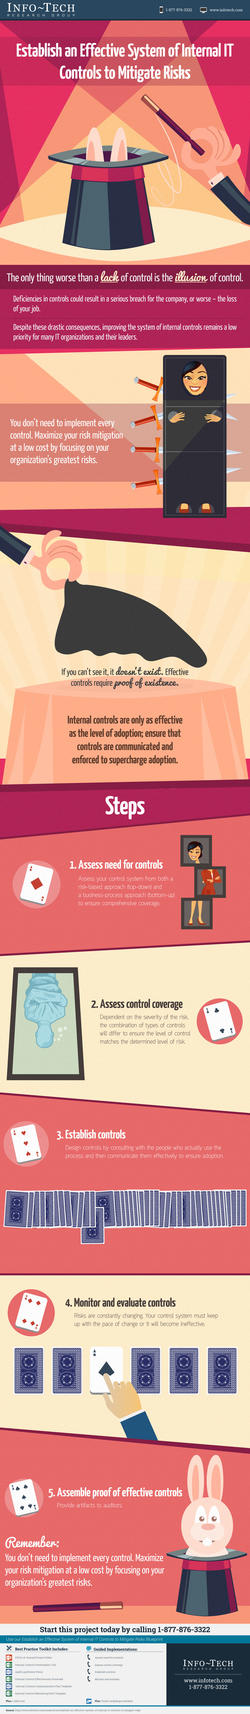 Establish an Effective System of Internal IT Controls to Mitigate Risks thumbnail